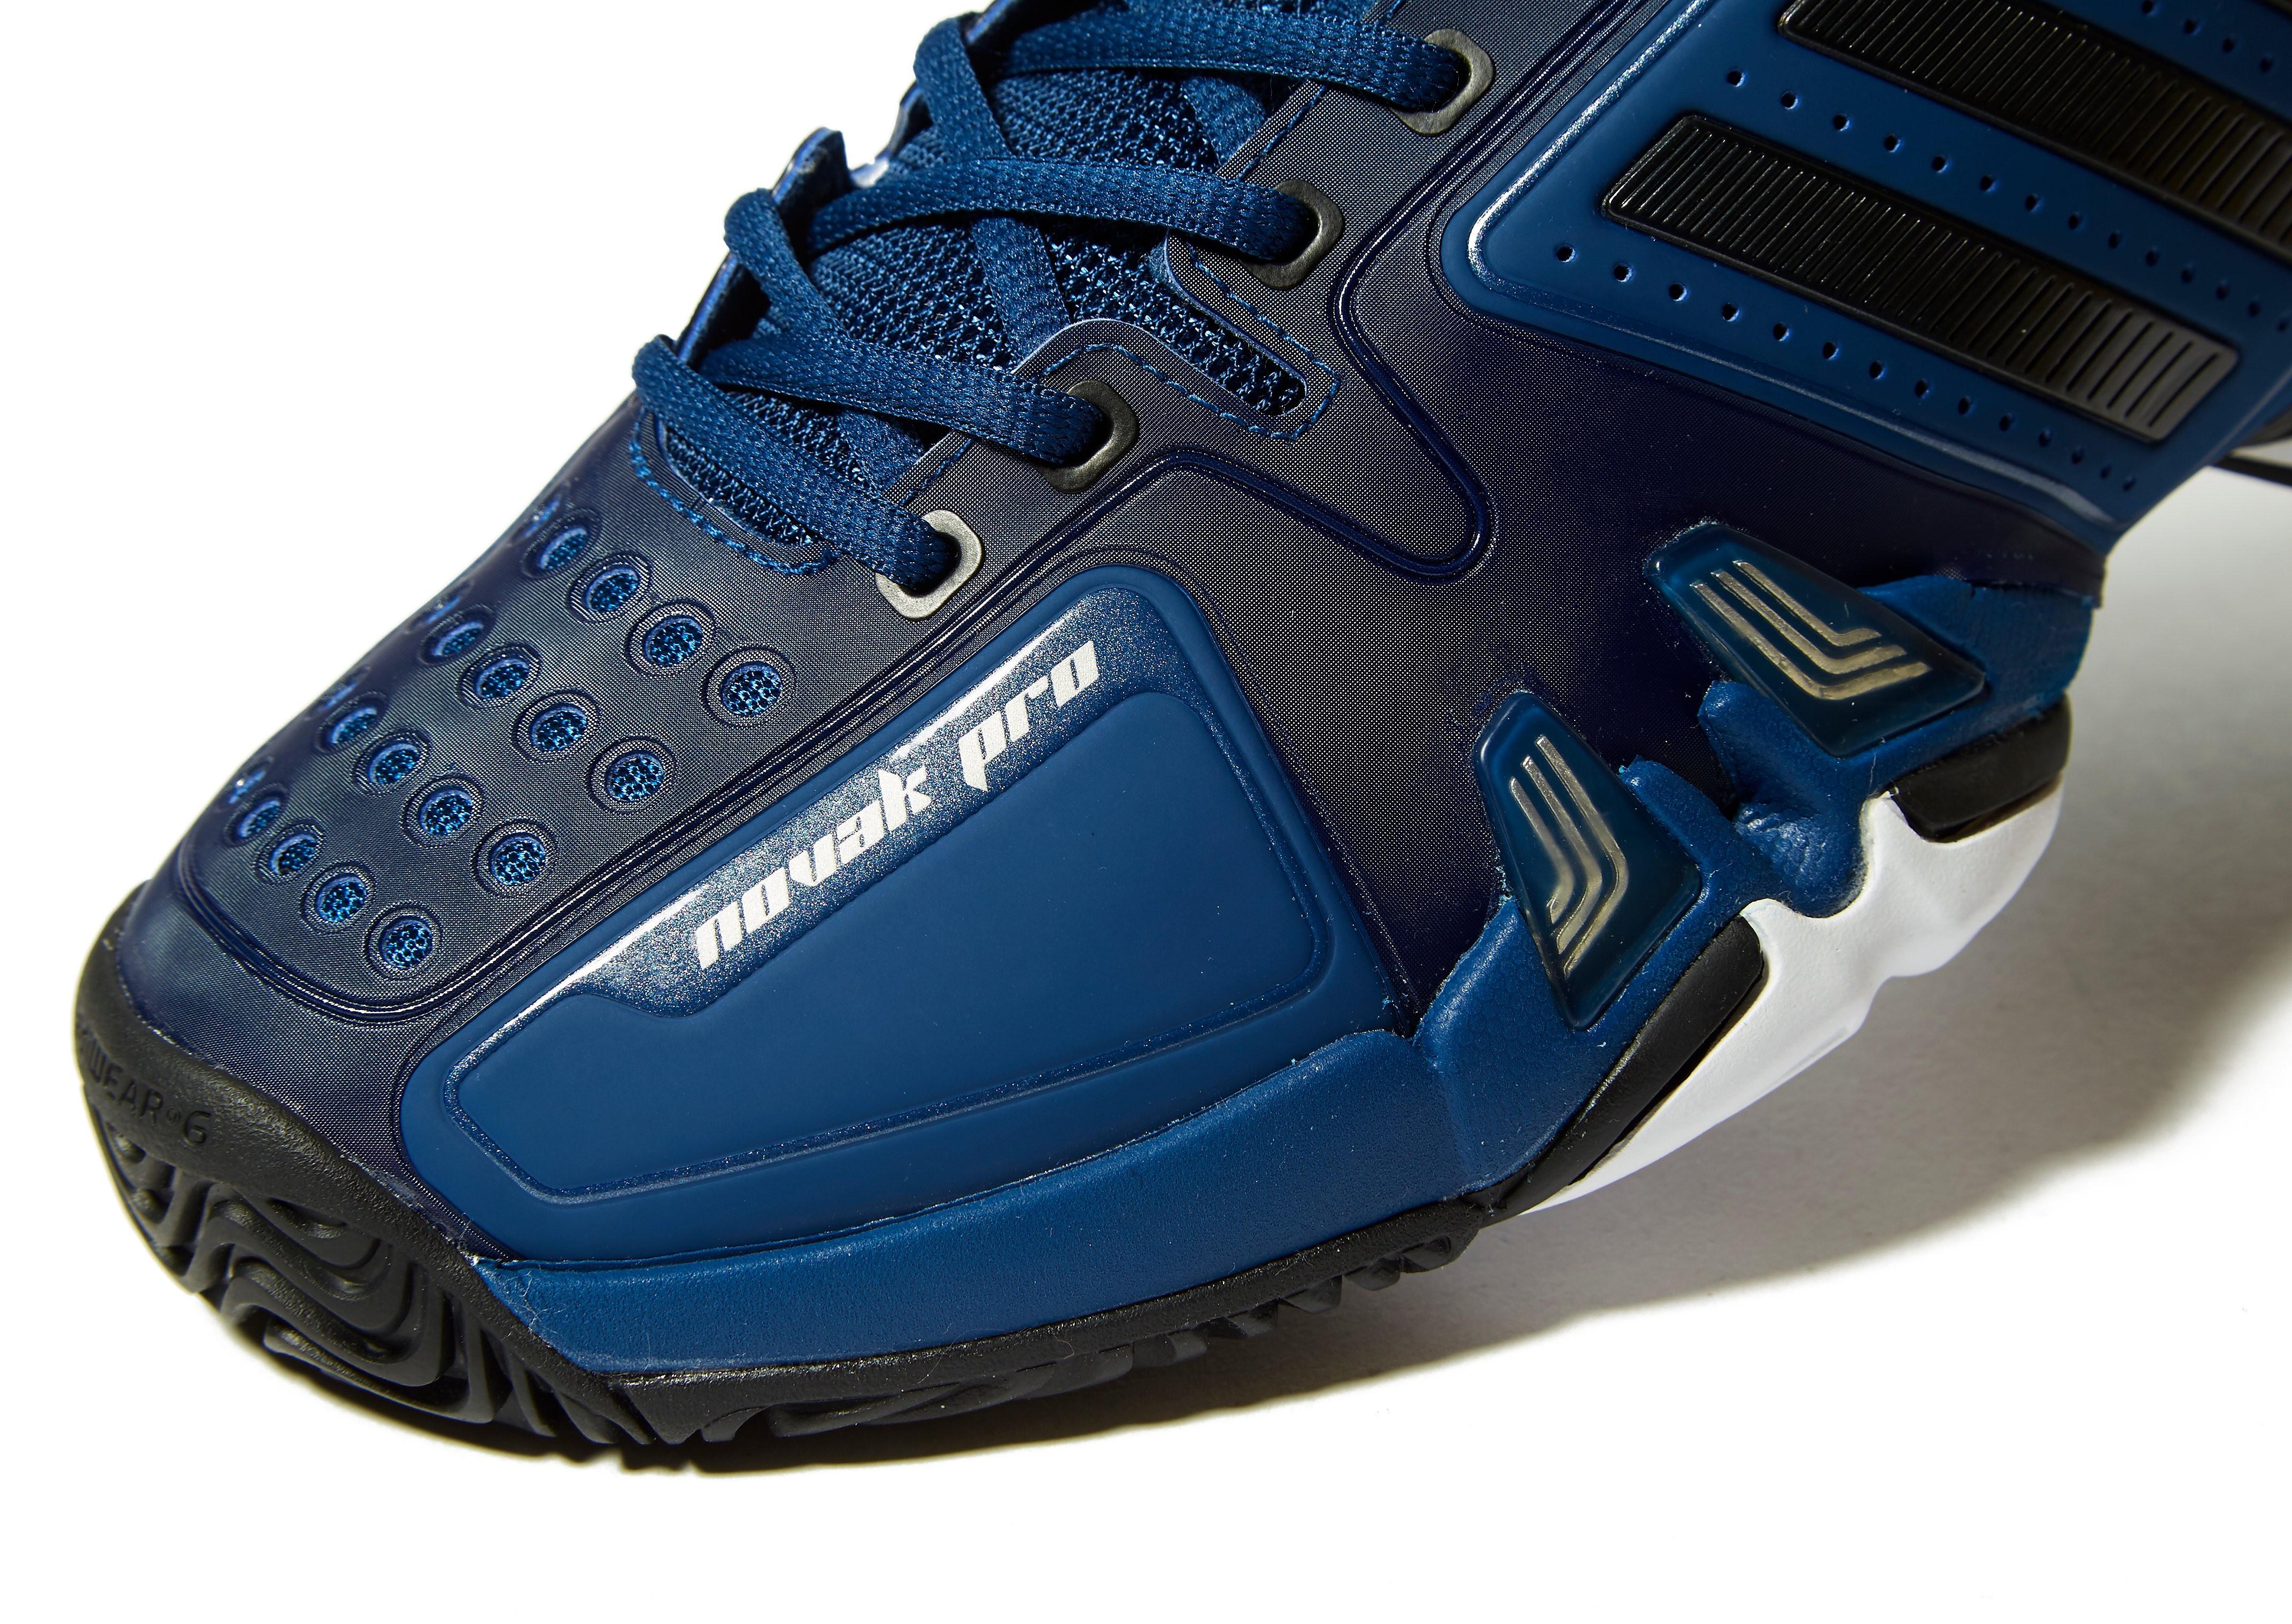 adidas Novak Djokovic Pro Tennis Shoes